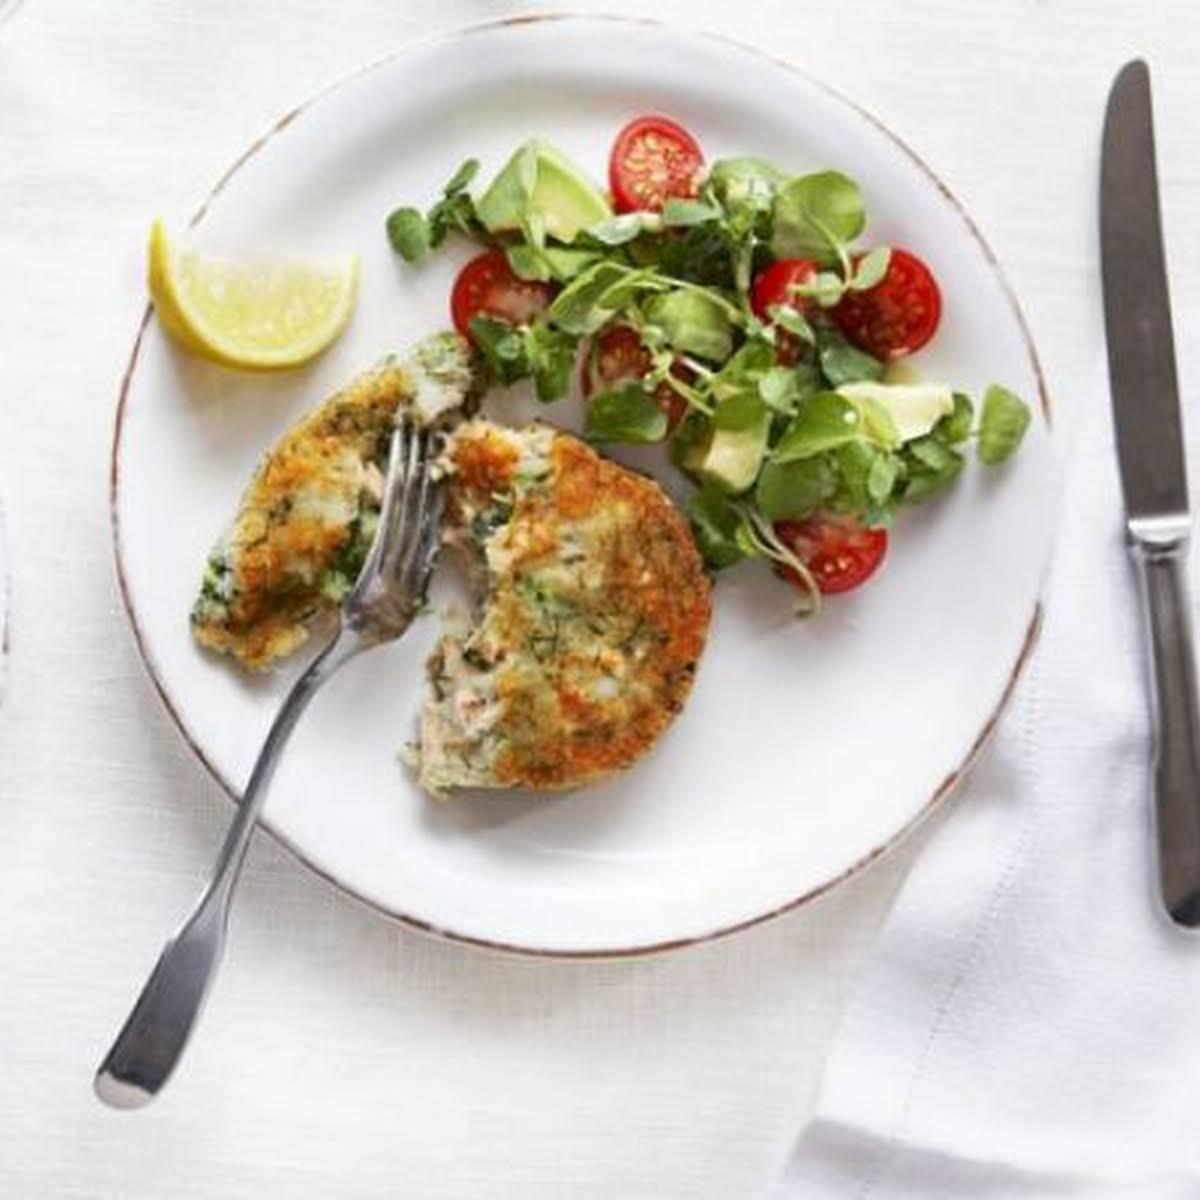 Salmon & Broccoli Cakes  taking into consideration Watercress, Avocado & Tomato Salad